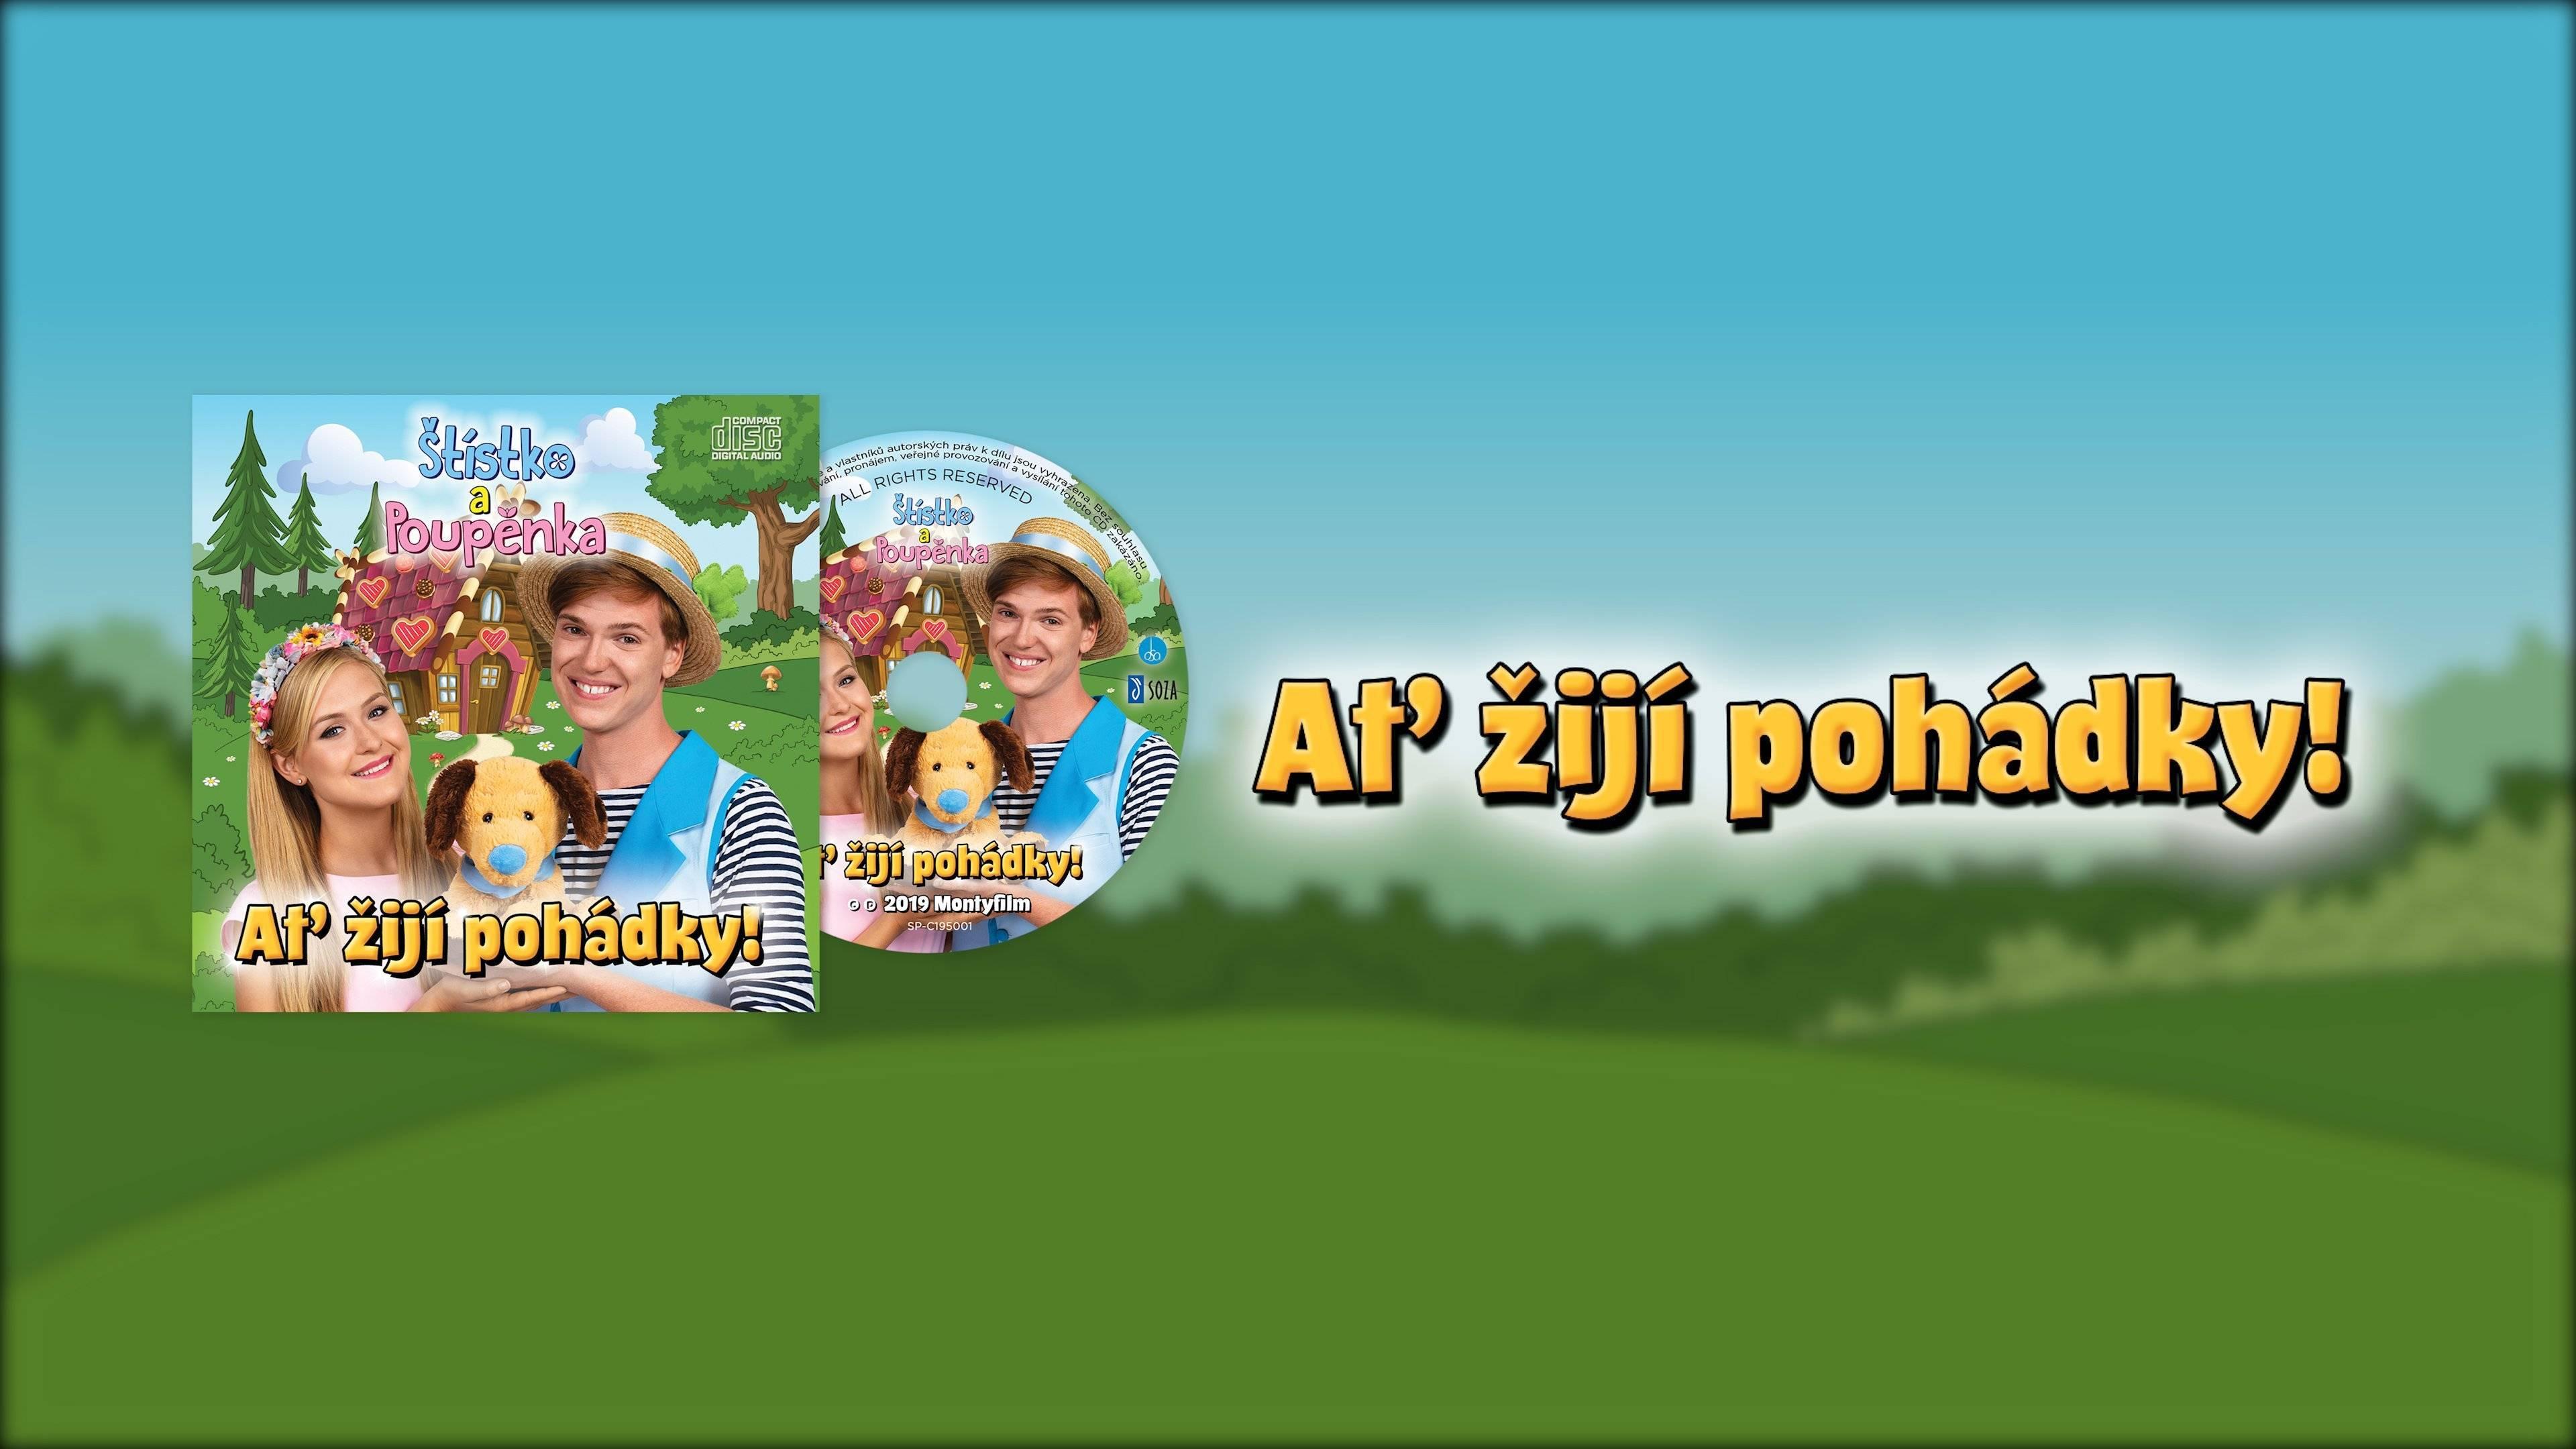 Štístko a Poupěnka CD – Ať žijí pohádky!